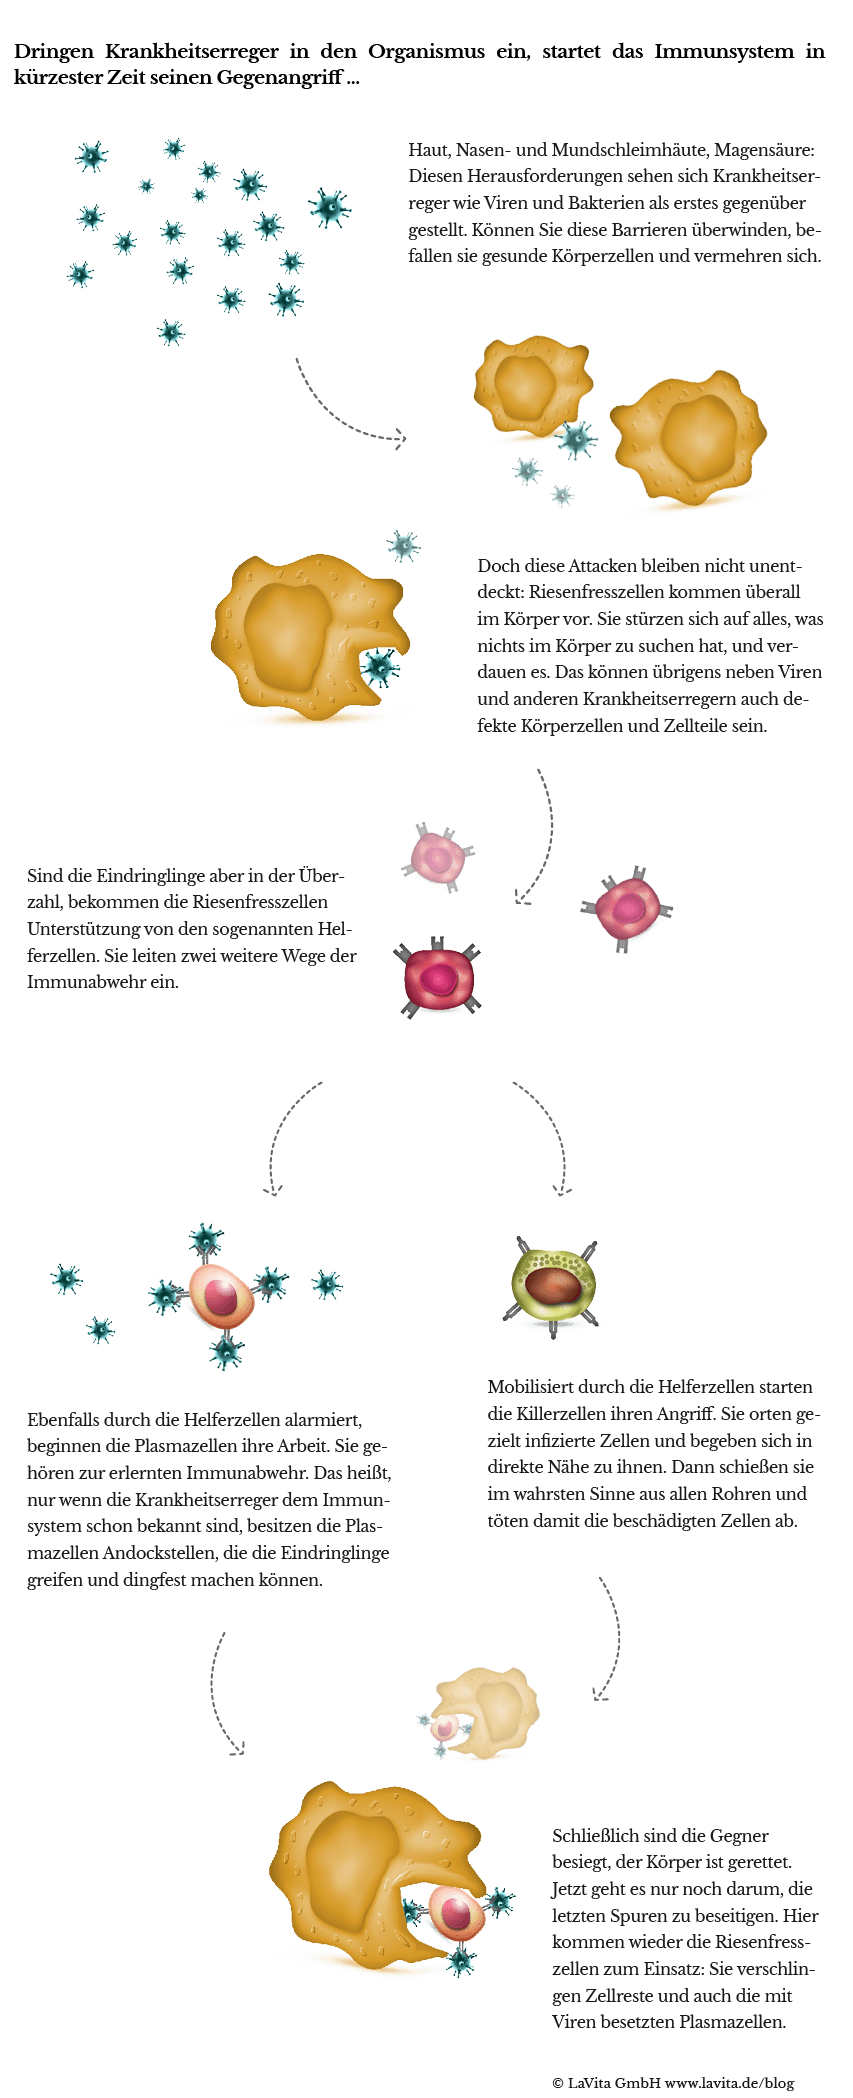 20151026_Immunsystem